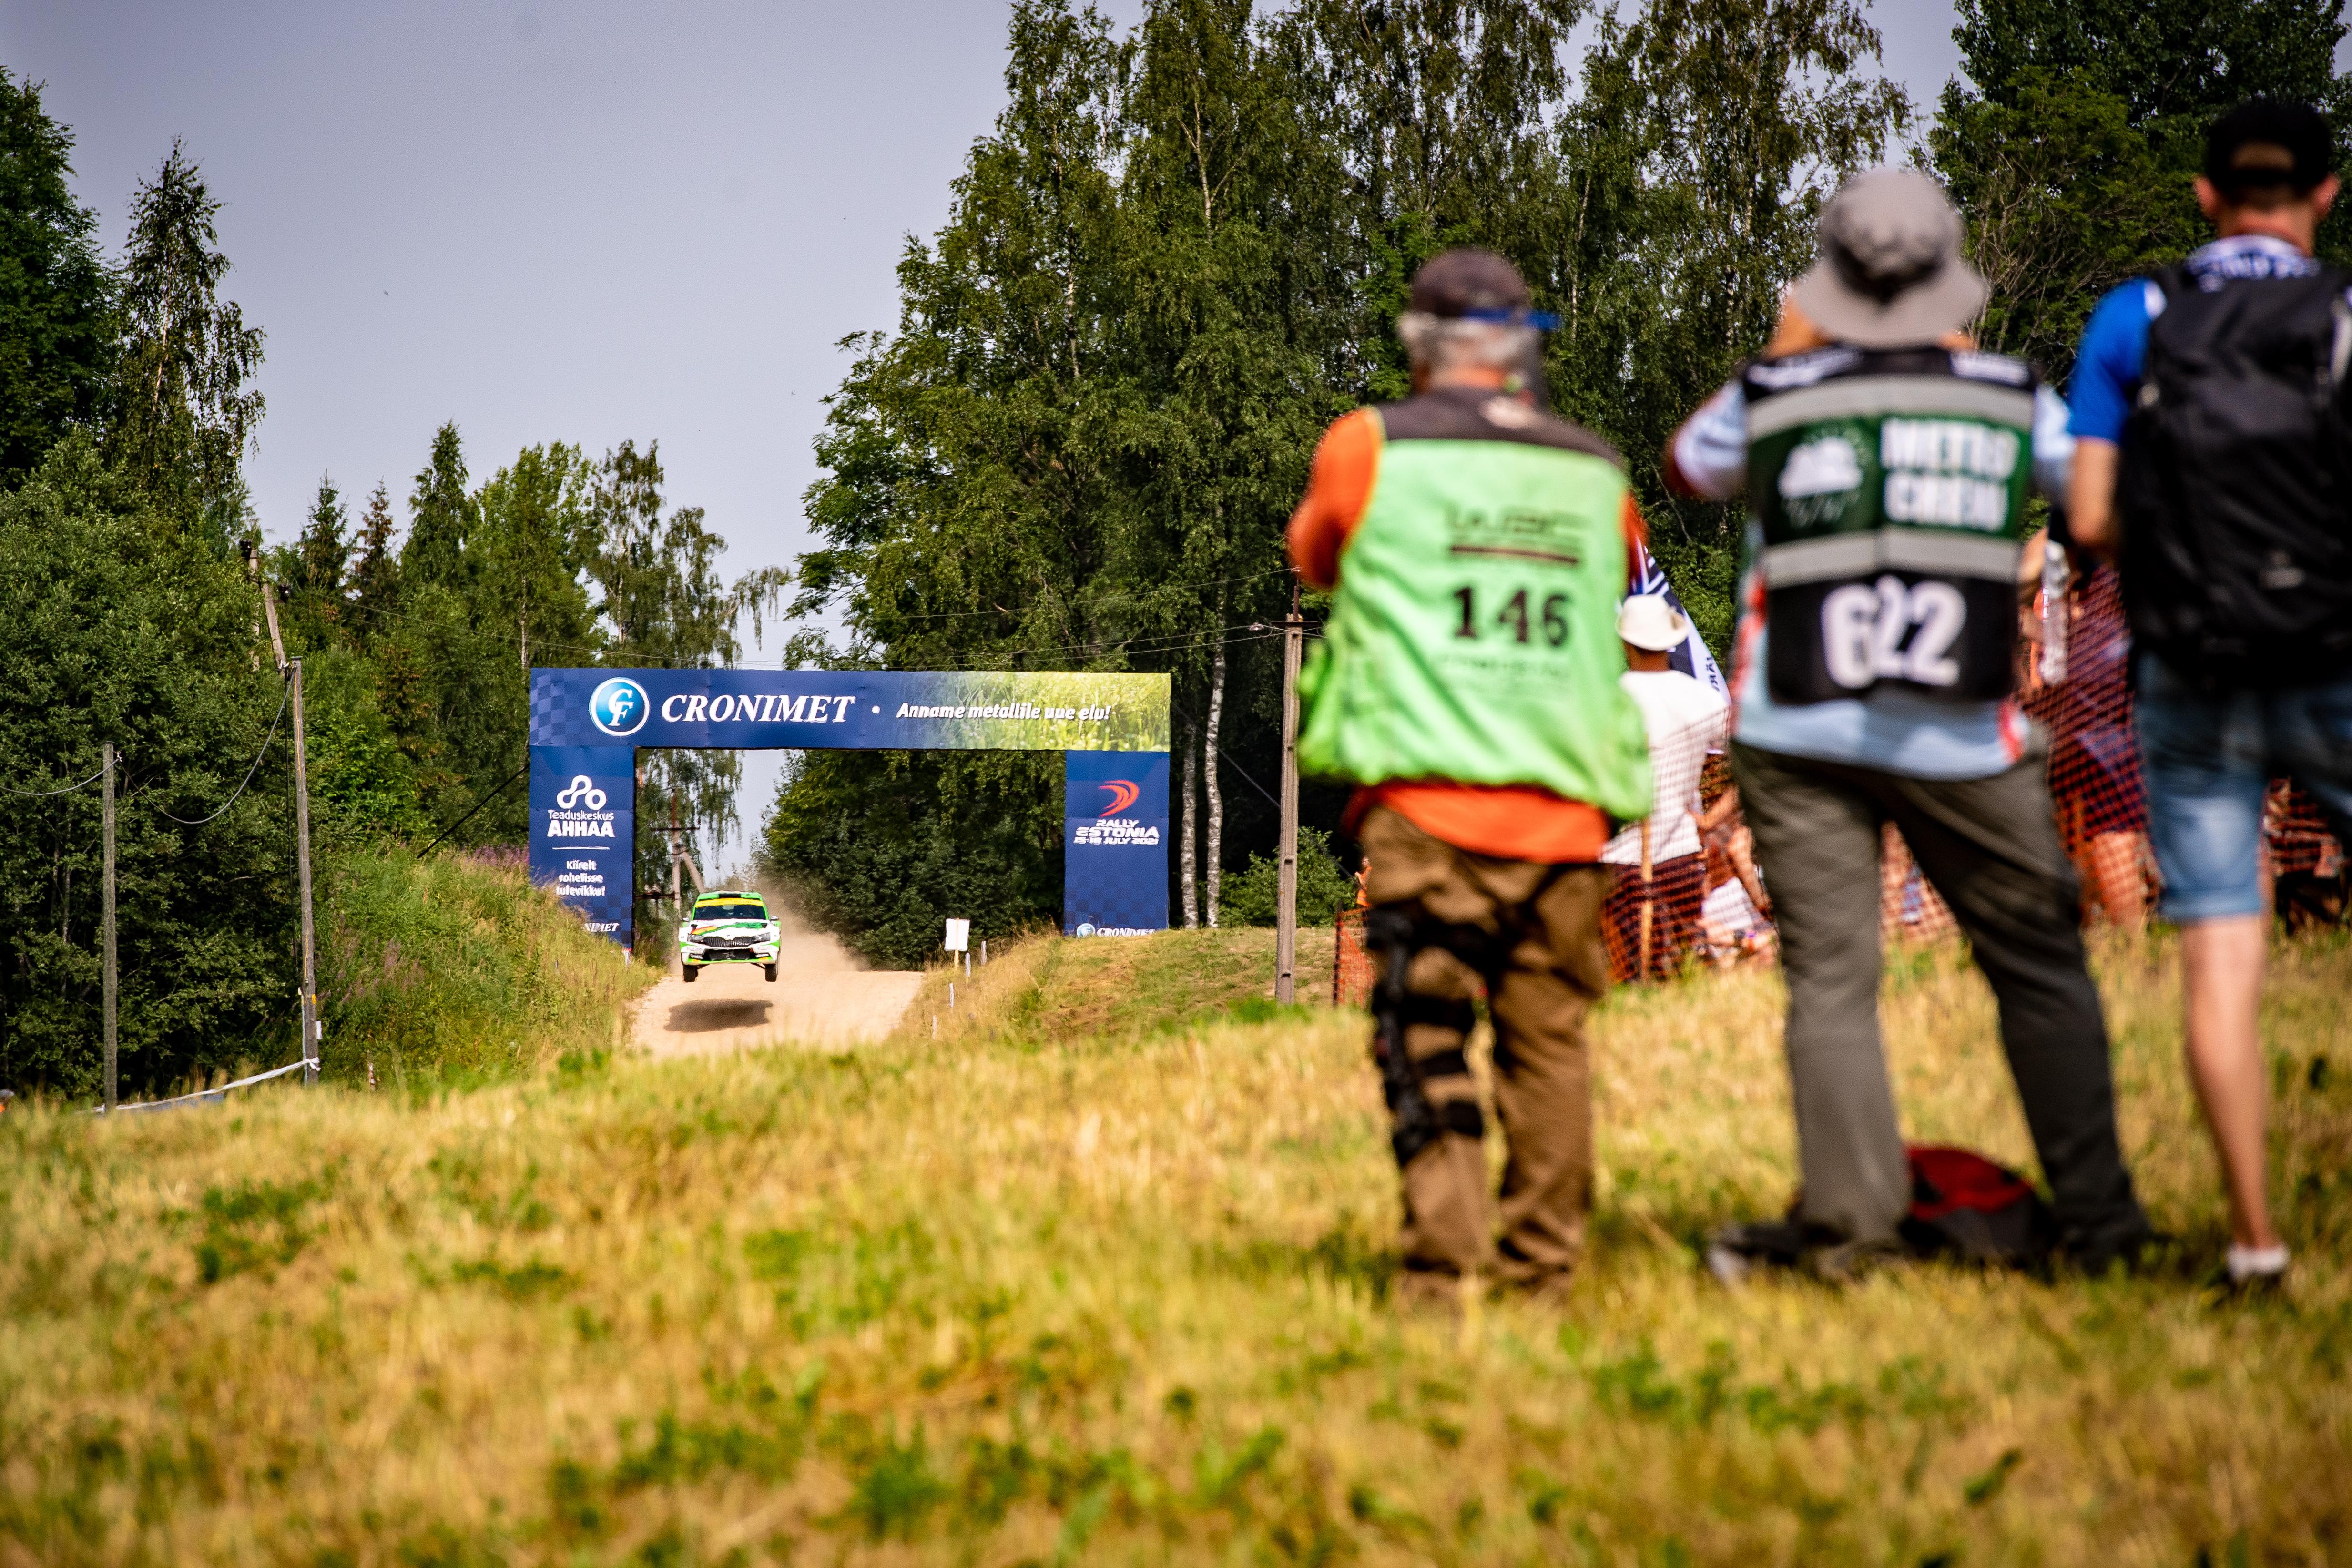 SKODA crews win WRC2 and WRC3 at Rally Estonia - Image 6